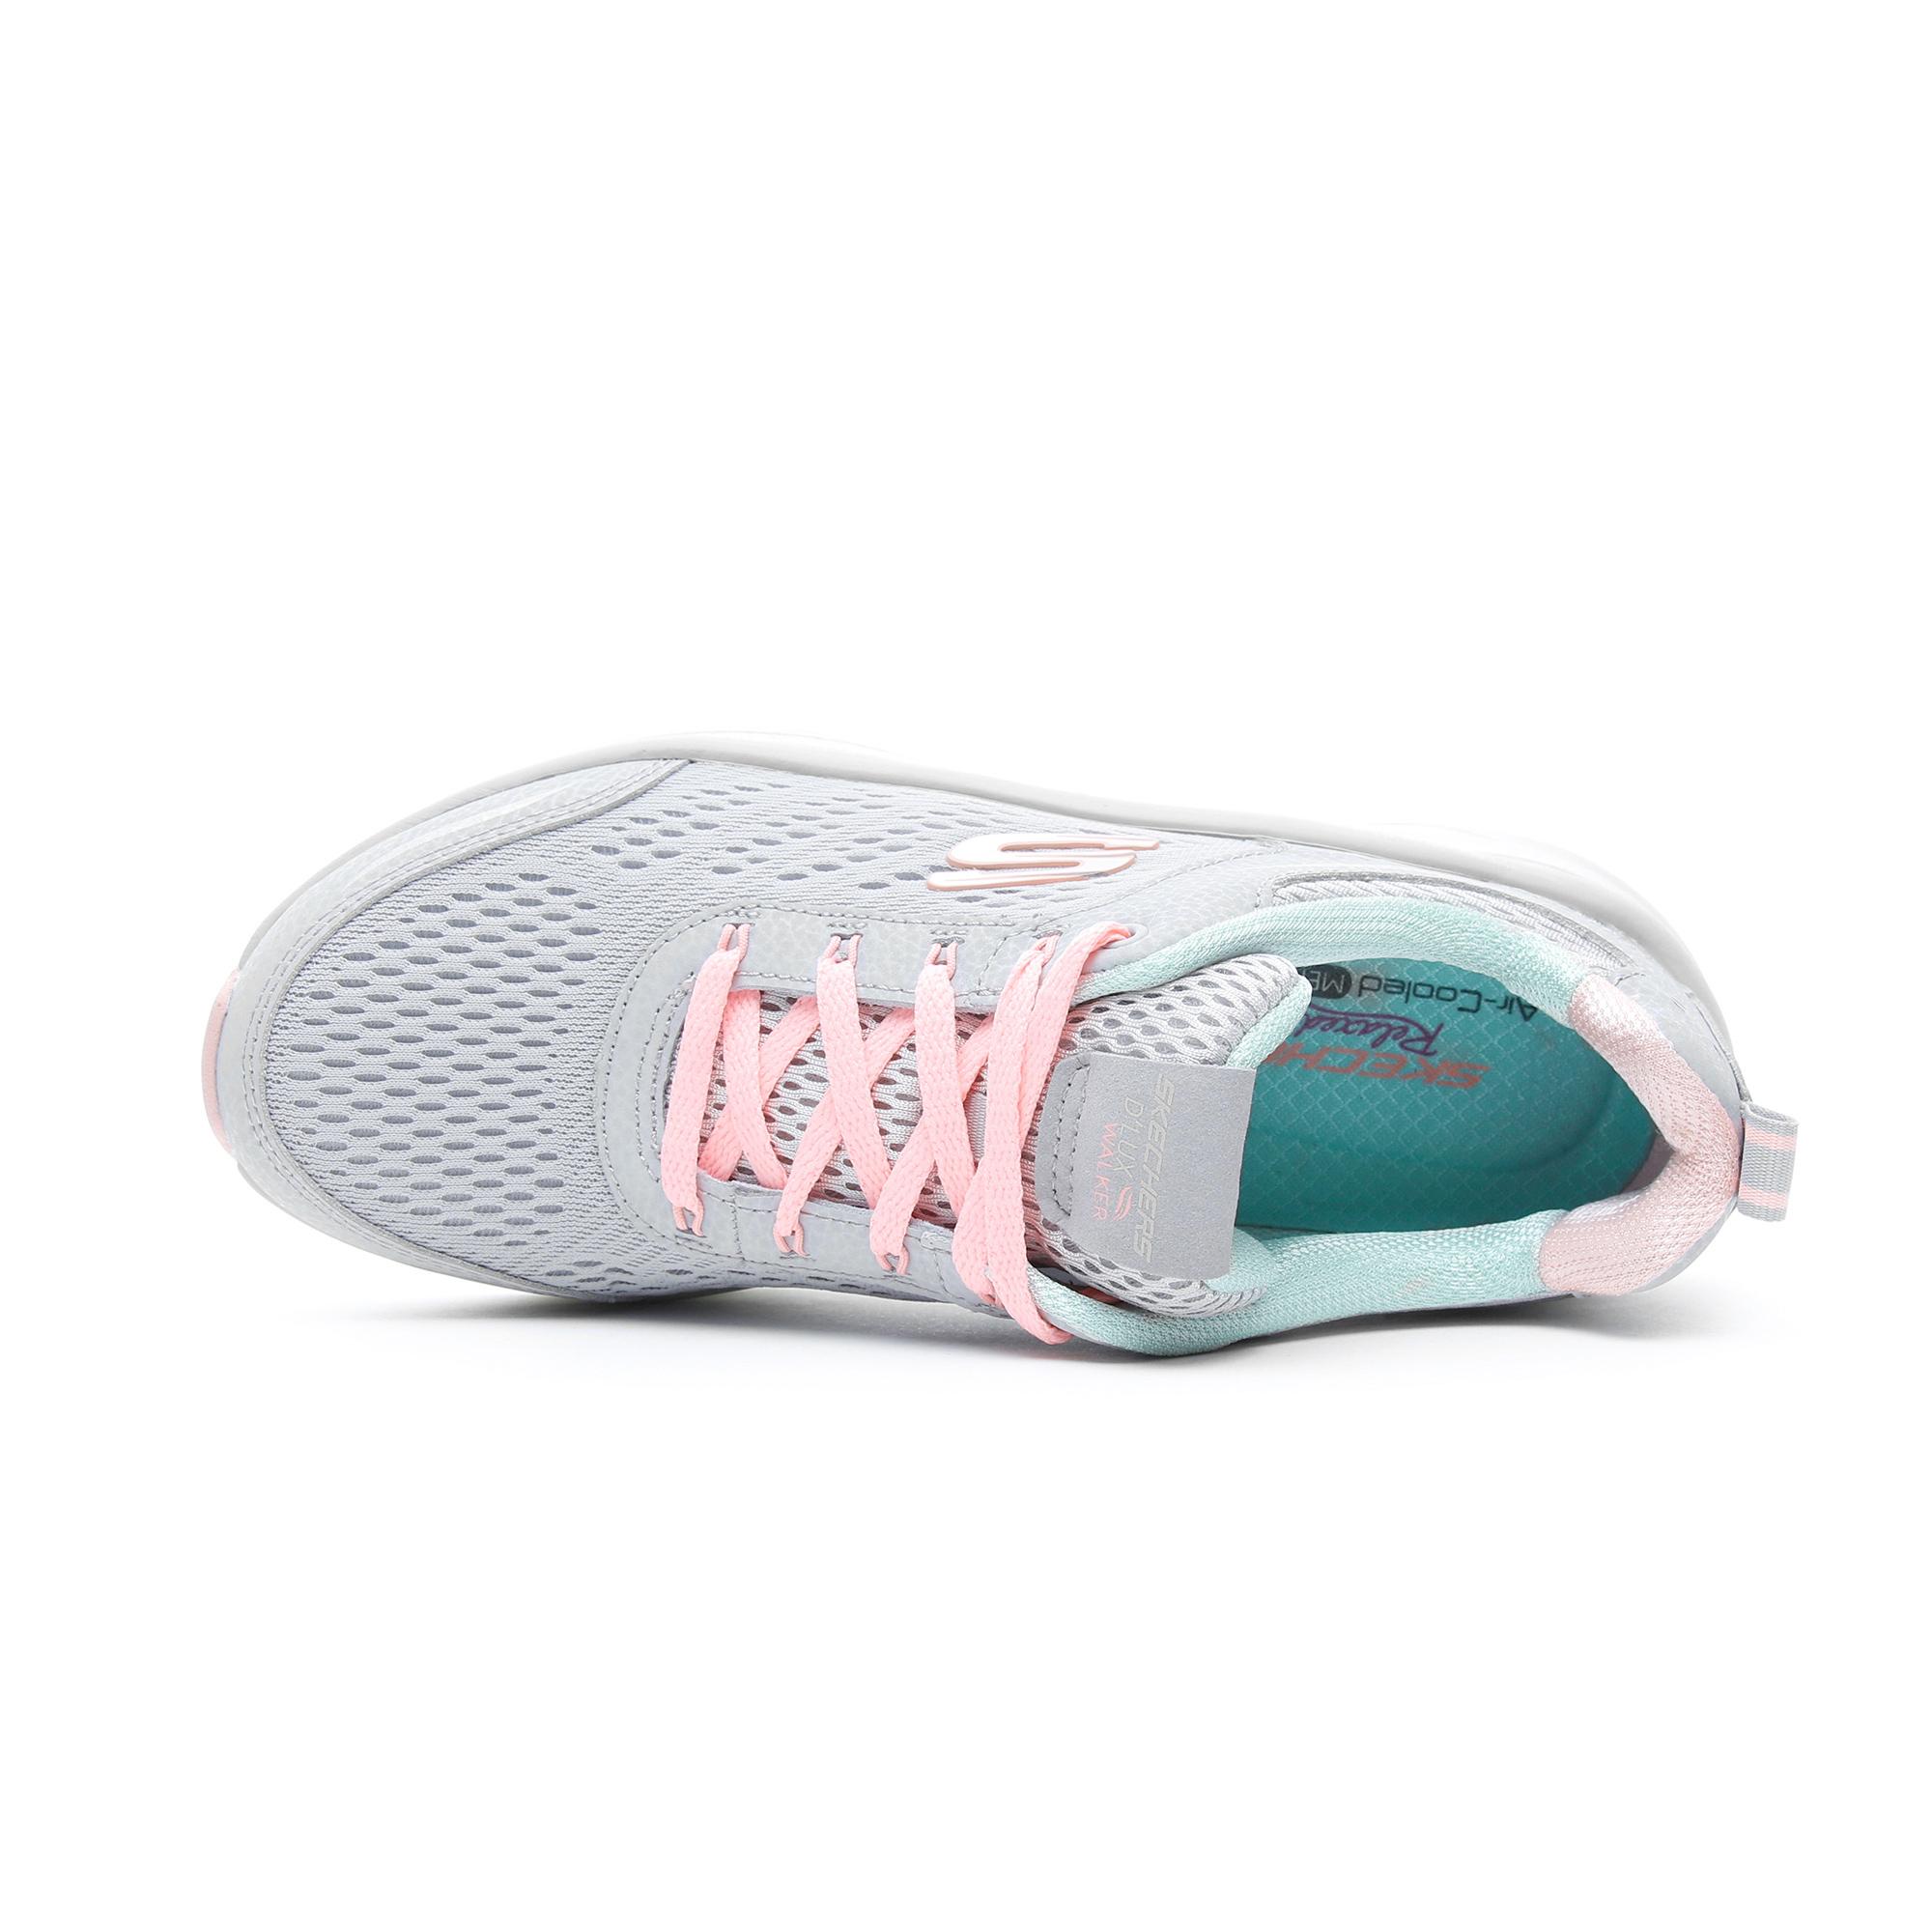 Skechers D'Lux Walker - Infinite Motion Kadın Gri Spor Ayakkabı